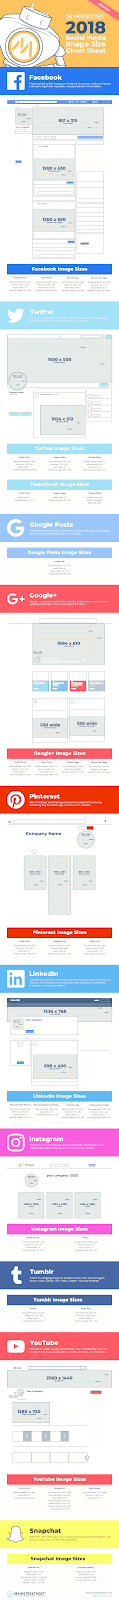 2018 social media sizes infographic compressor